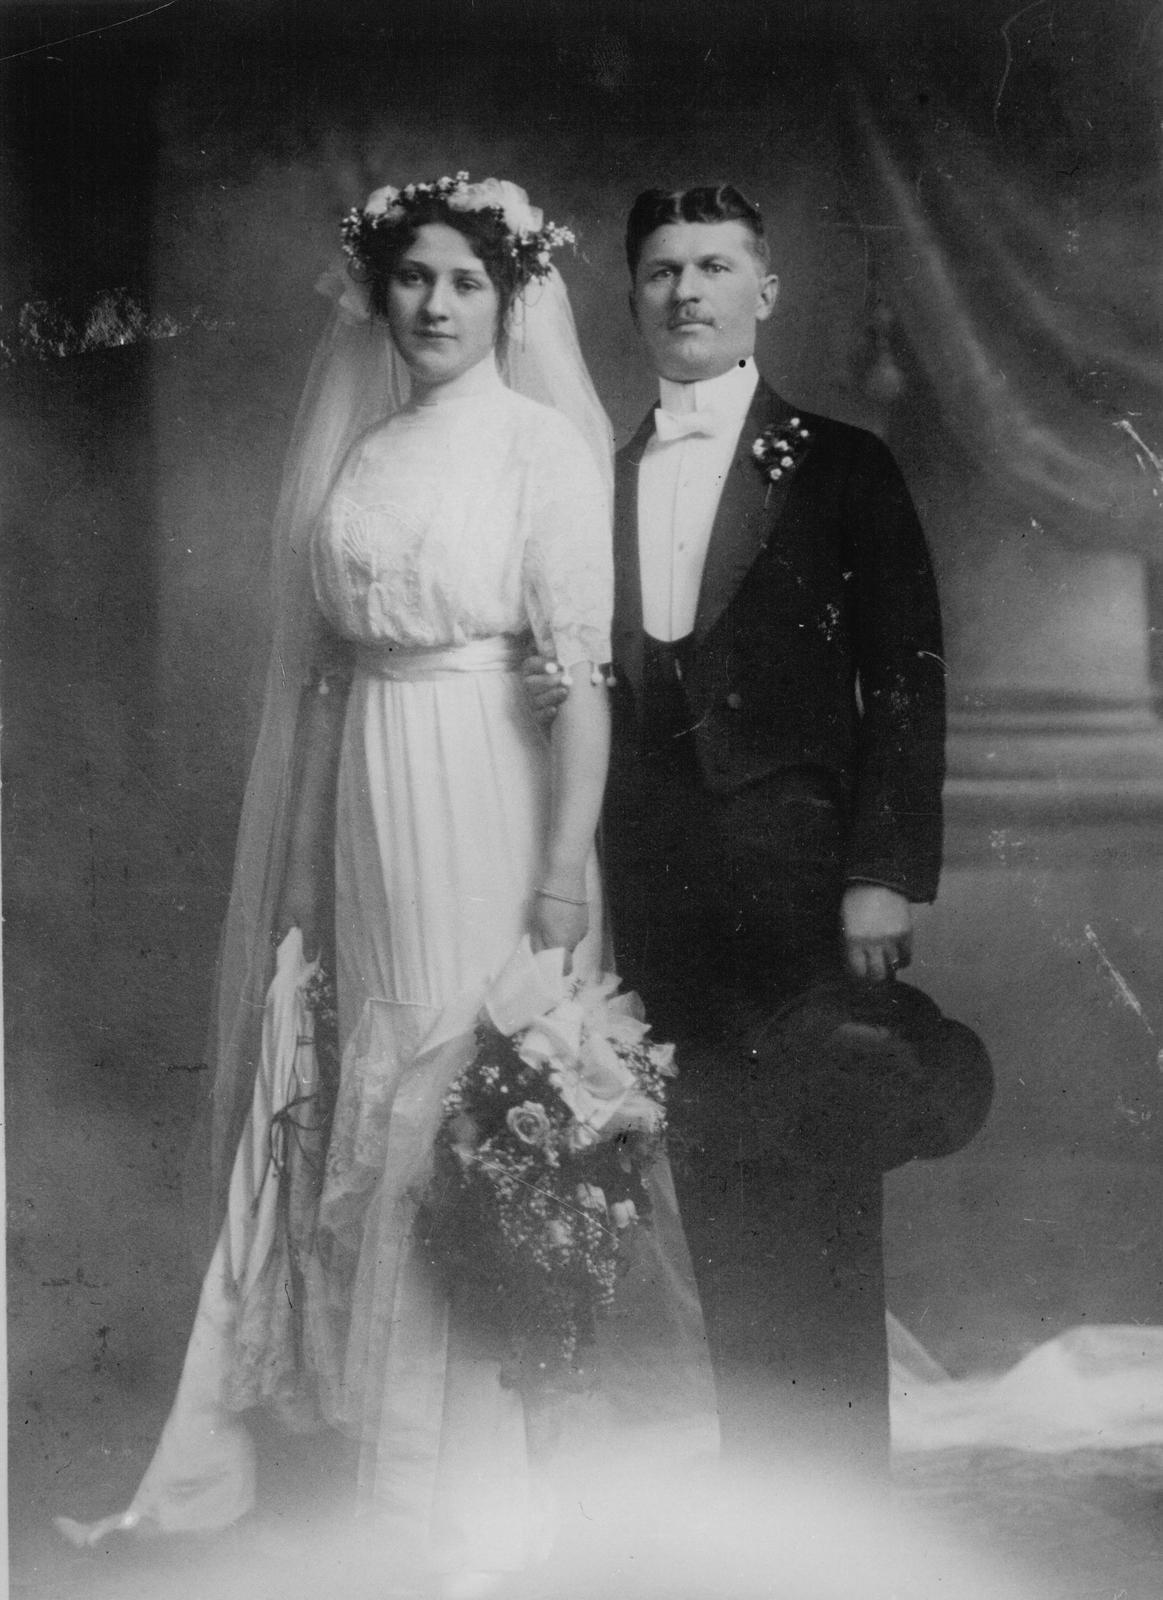 Svatby celebrit - Tomáš Baťa a Marie Menčíková (1912)